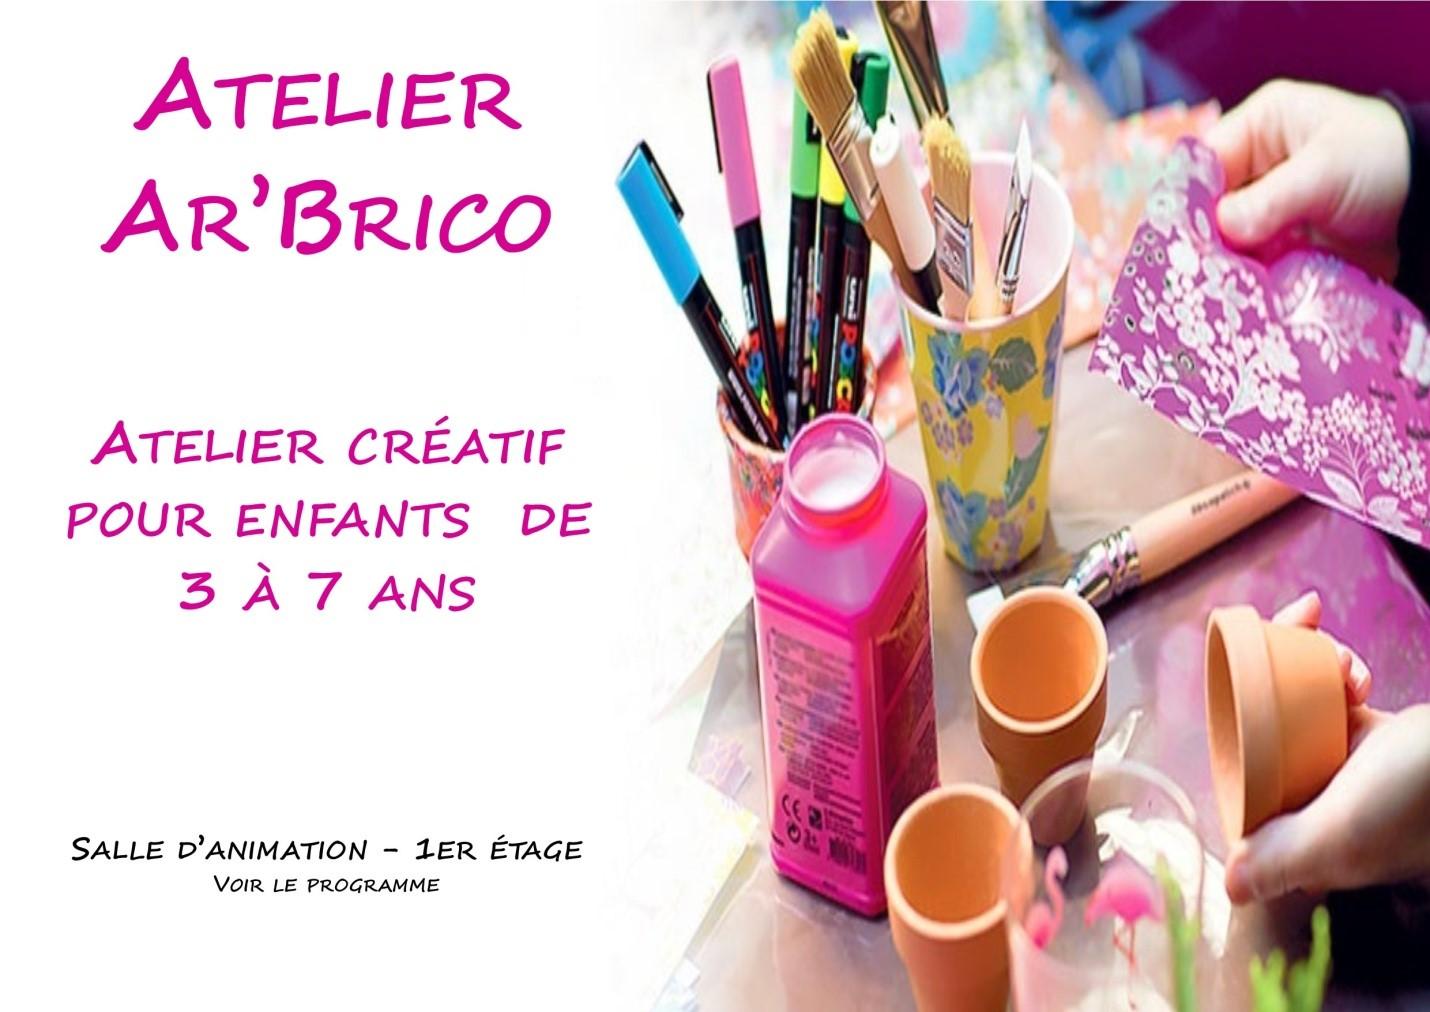 L'Atelier Ar'Brico